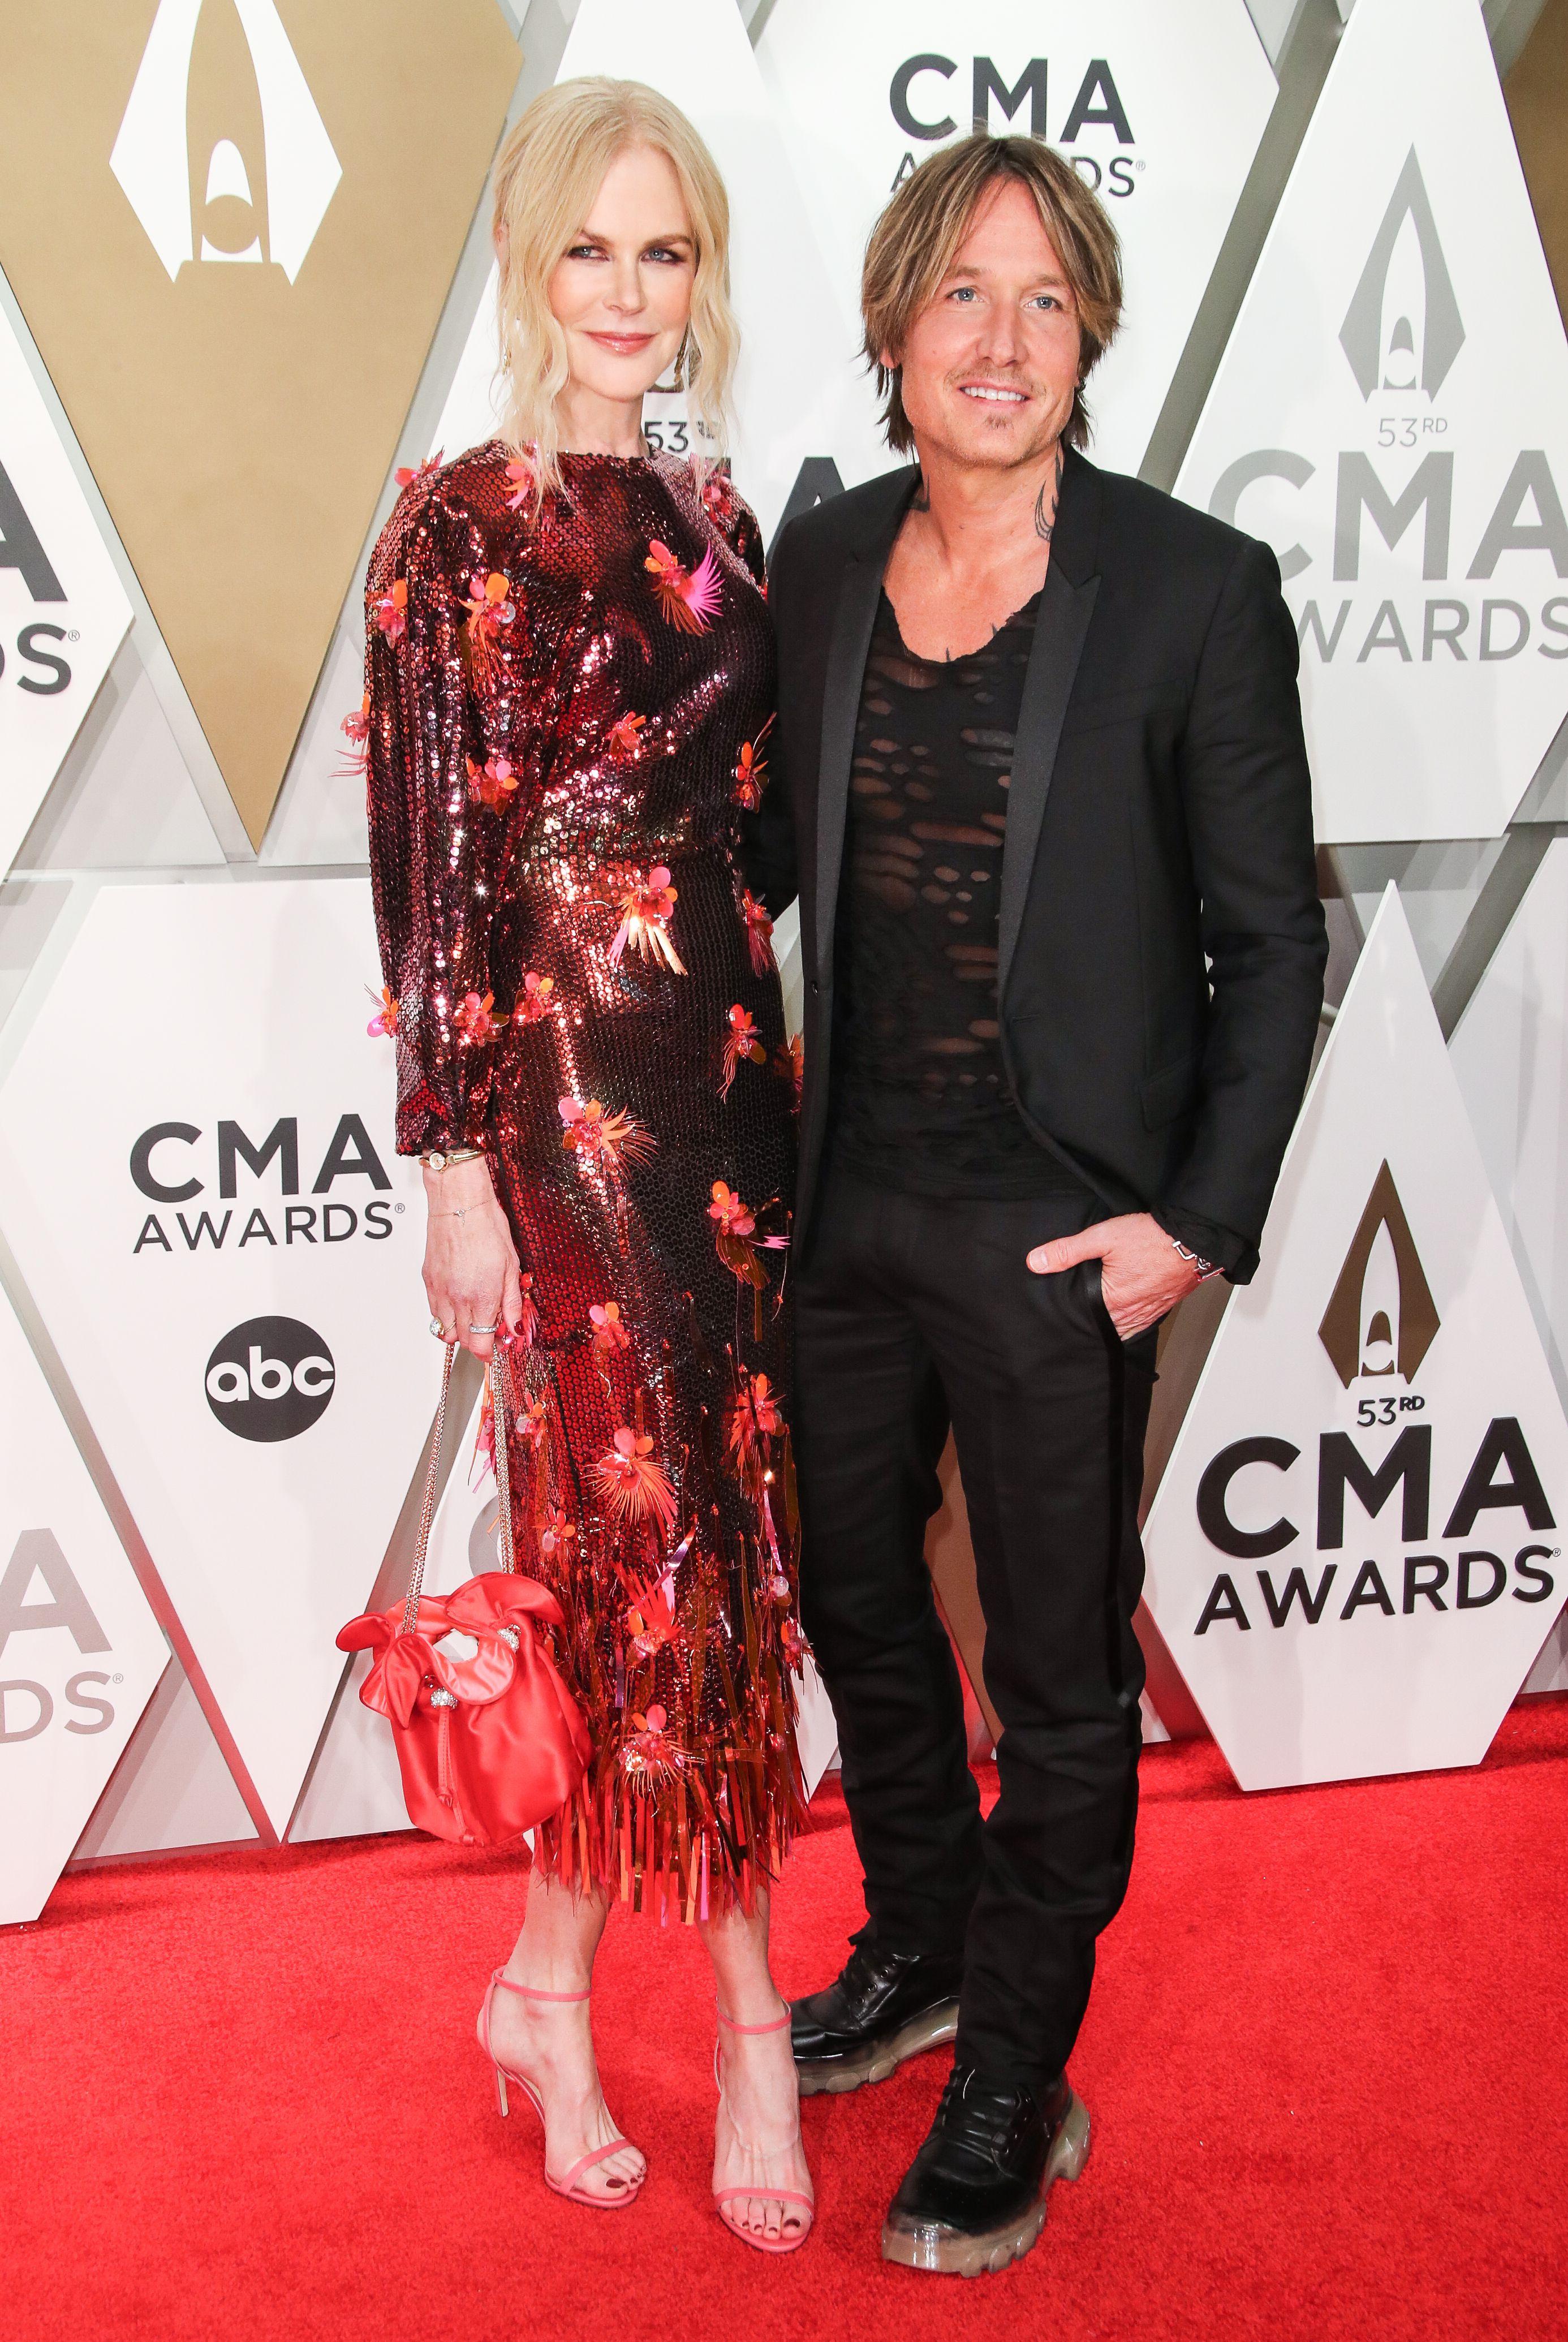 Nicole Kidman and Keith Urban at the CMAs 2019 Red Carpet